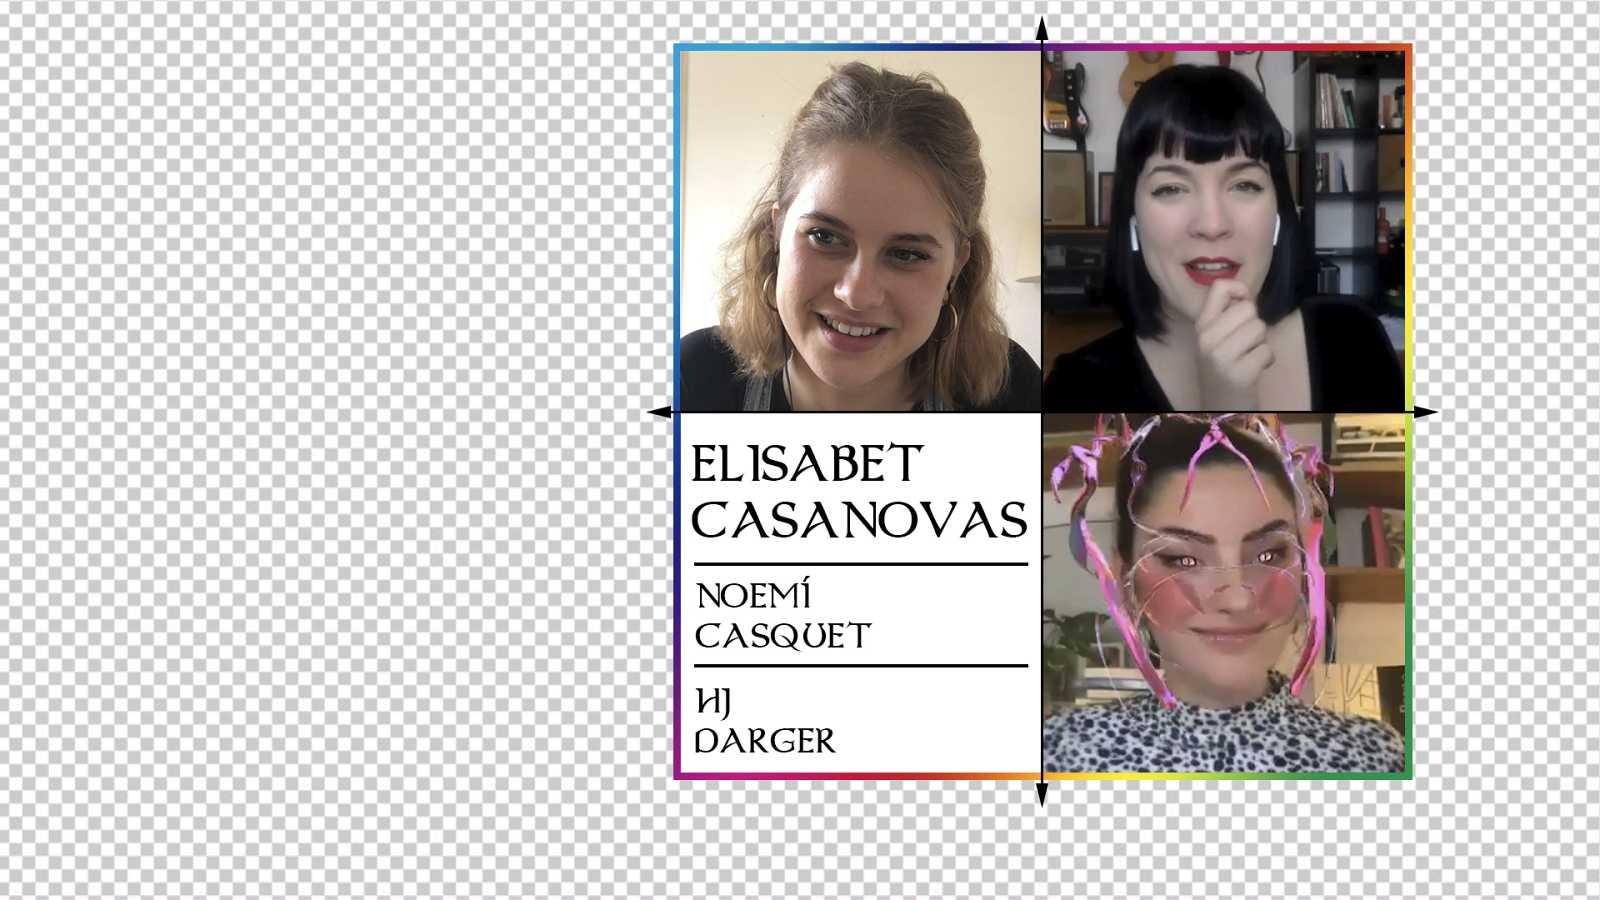 OK Playz - OK Playz con Elisabet Casanovas, Noemí Casquet y HJ Darger